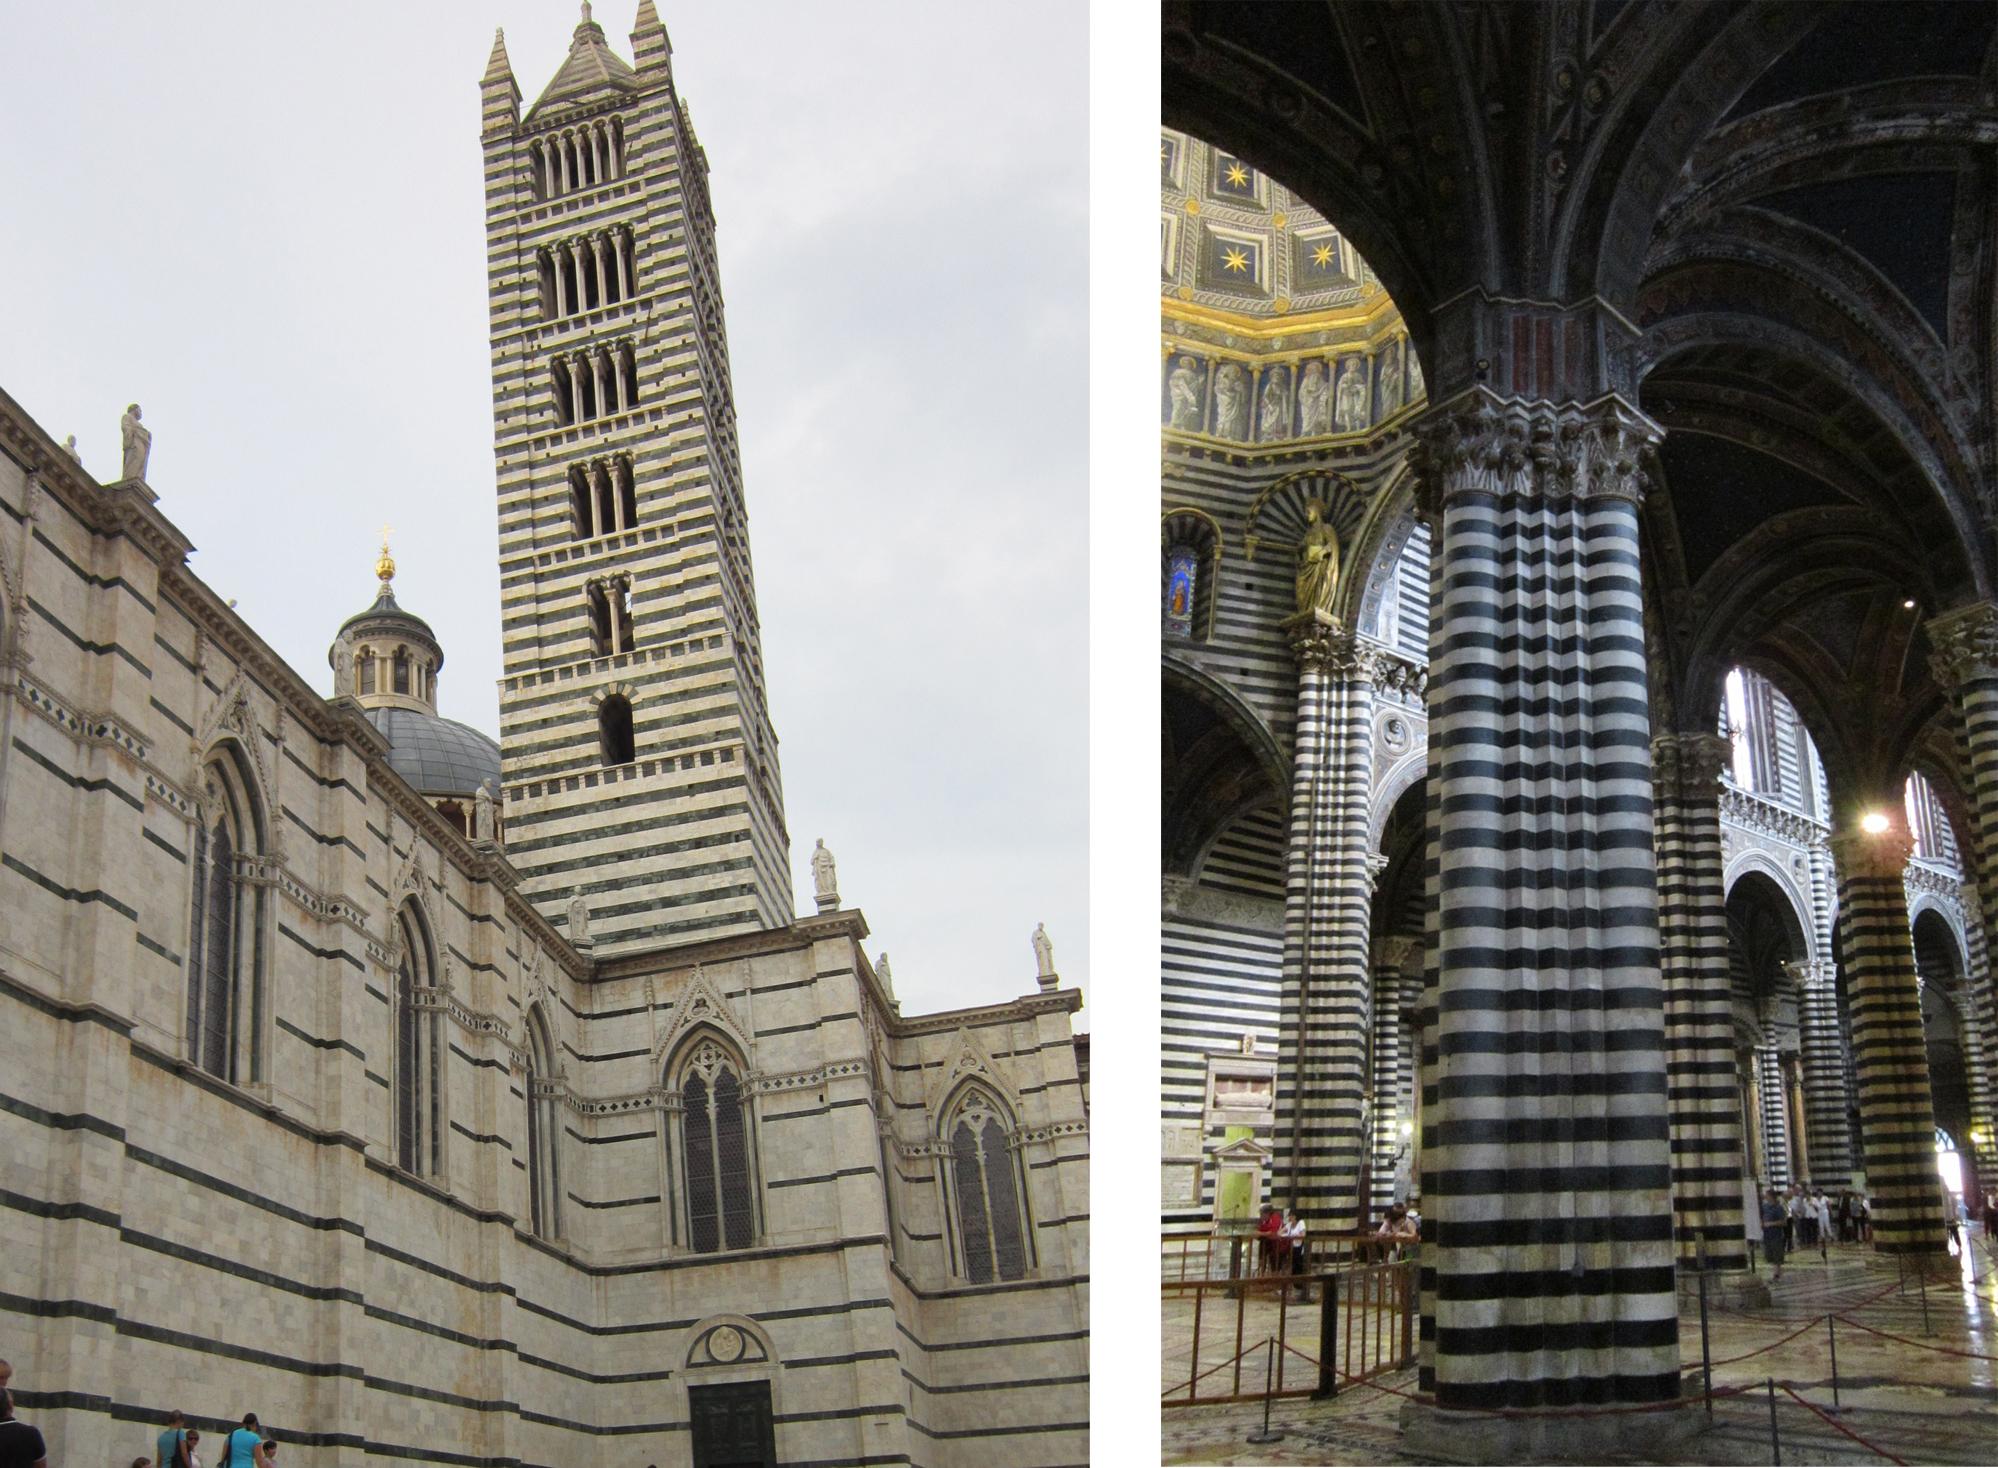 Duomo Siena-2images.jpg